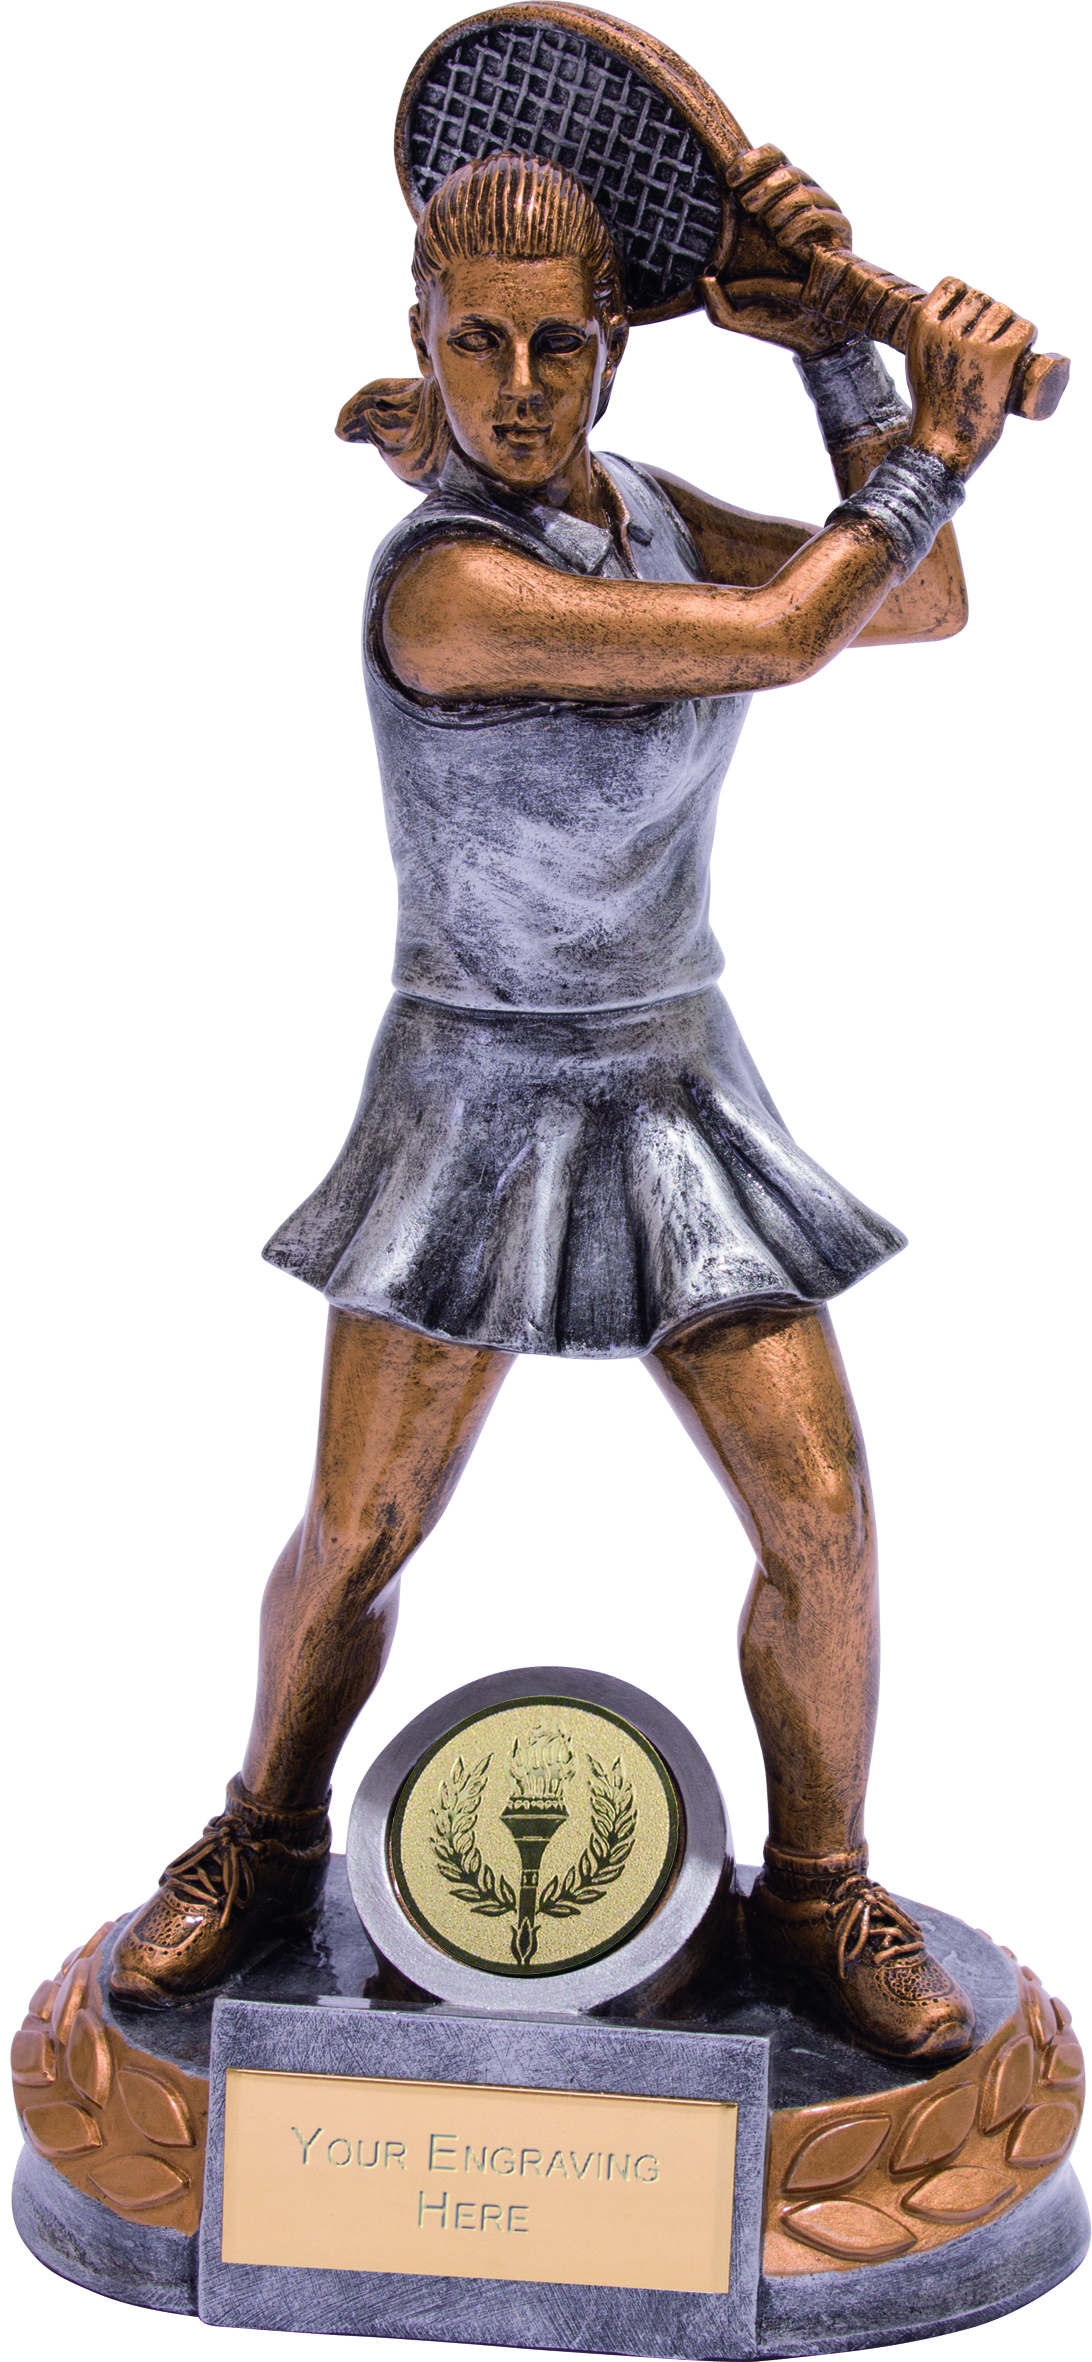 "Female Tennis Player Trophy Silver & Gold 18cm (7"")"